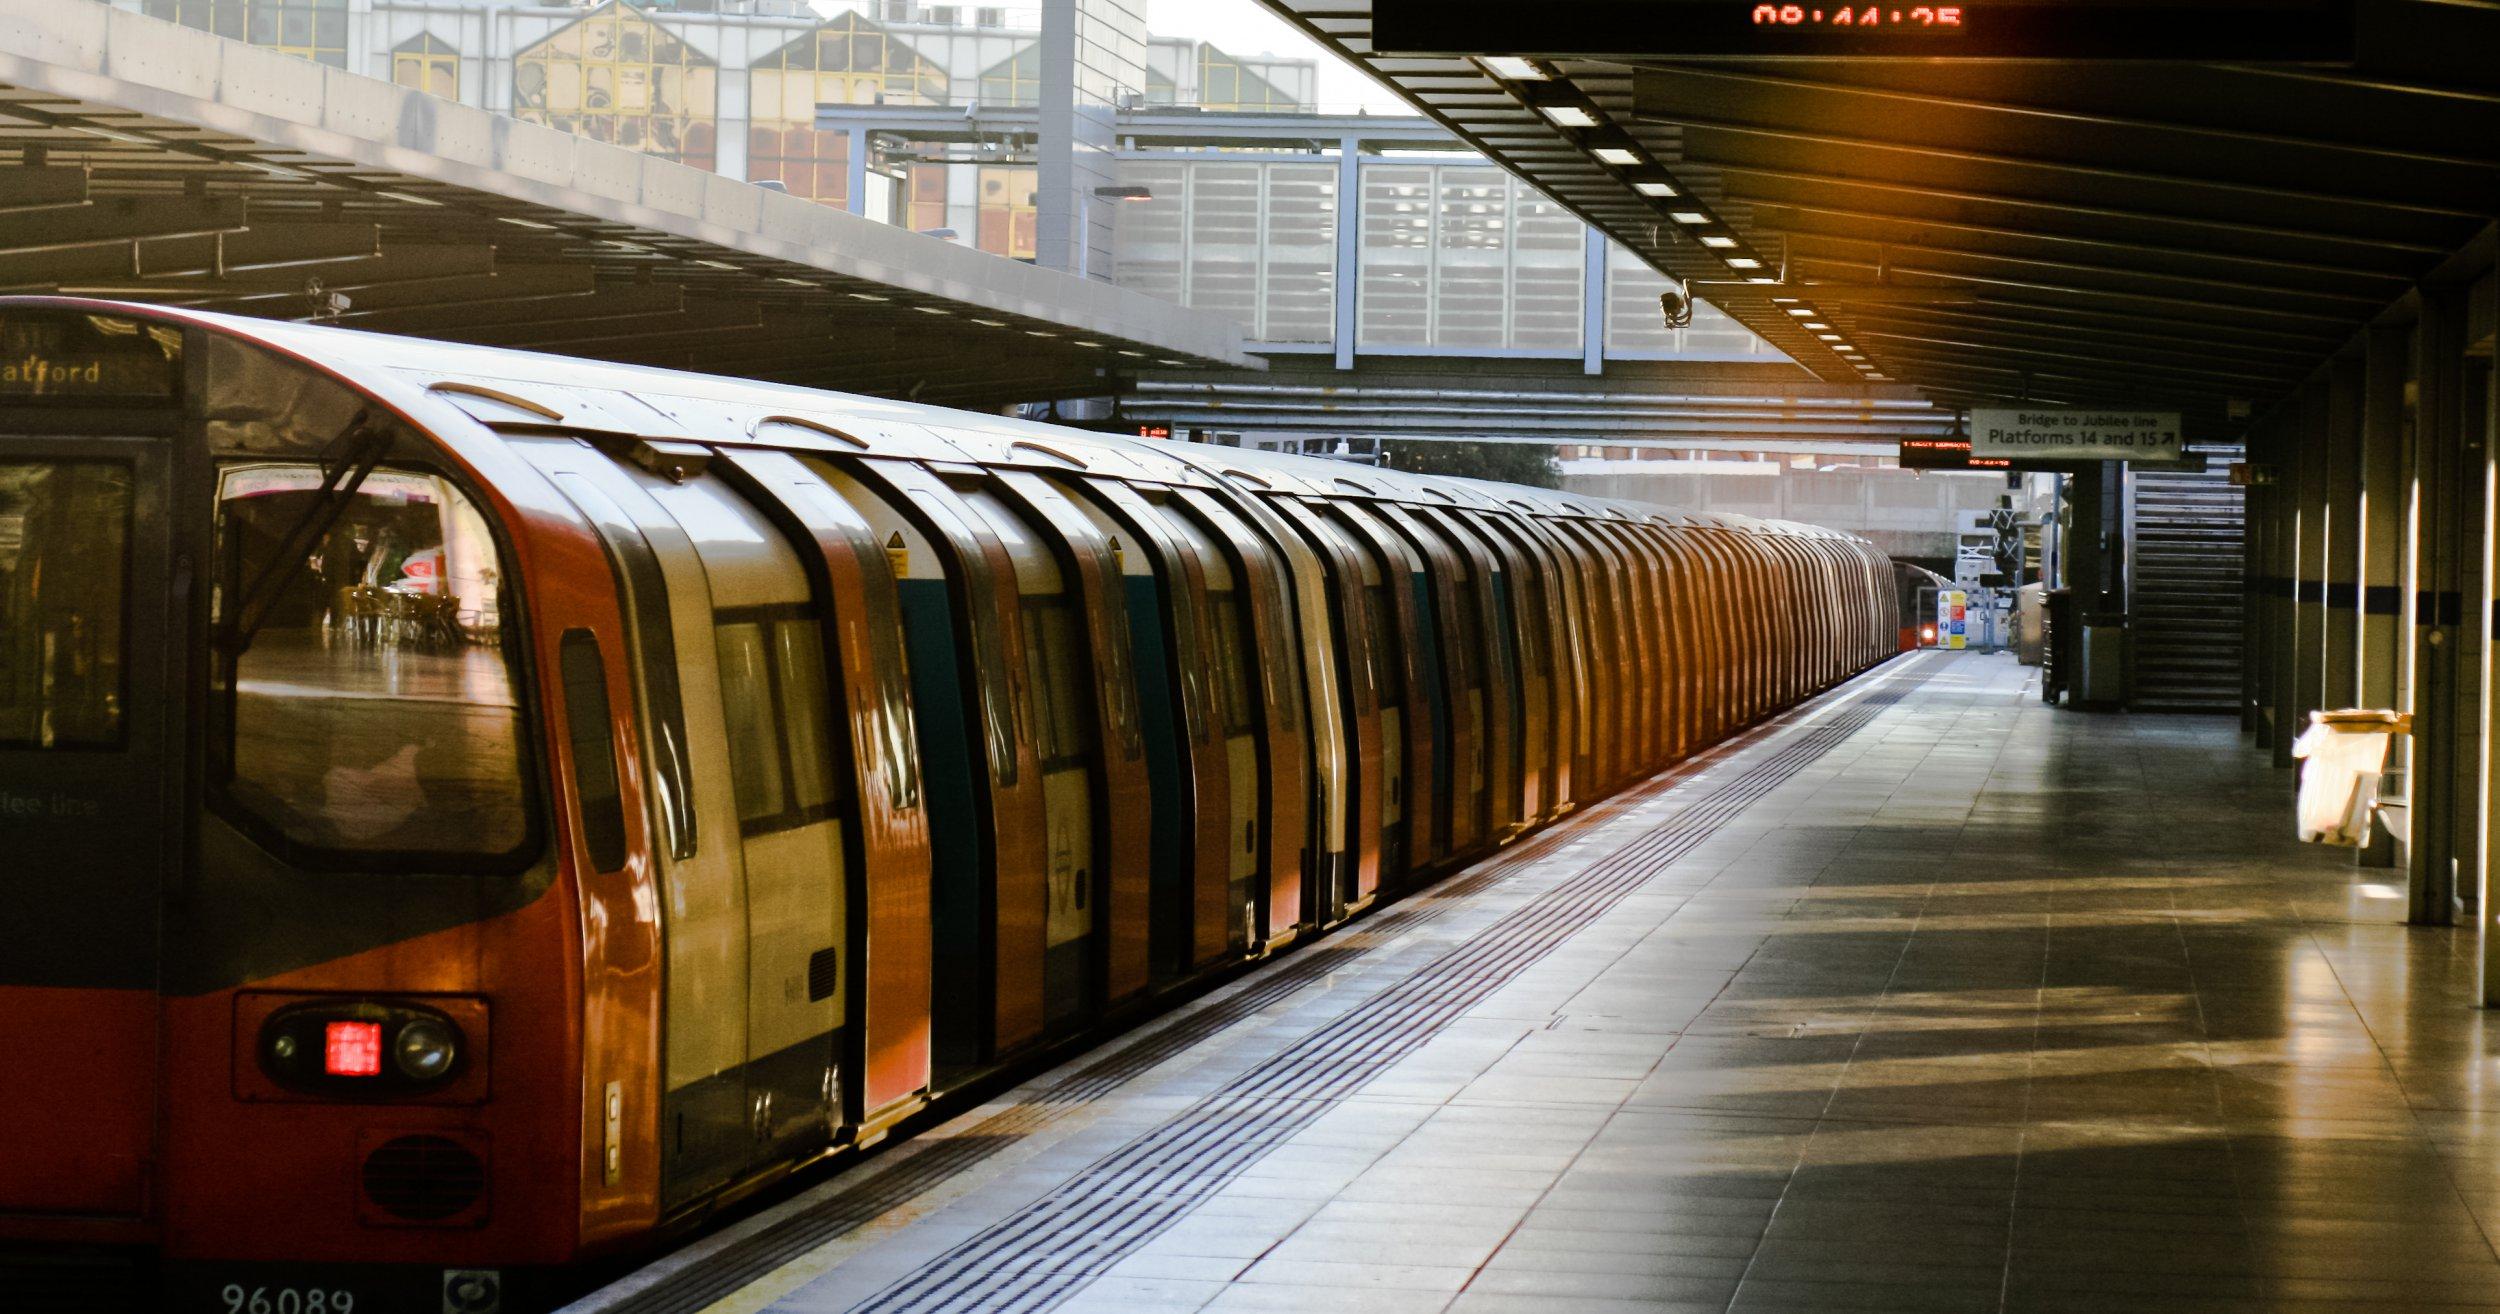 Most delayed London Underground line of last year revealed